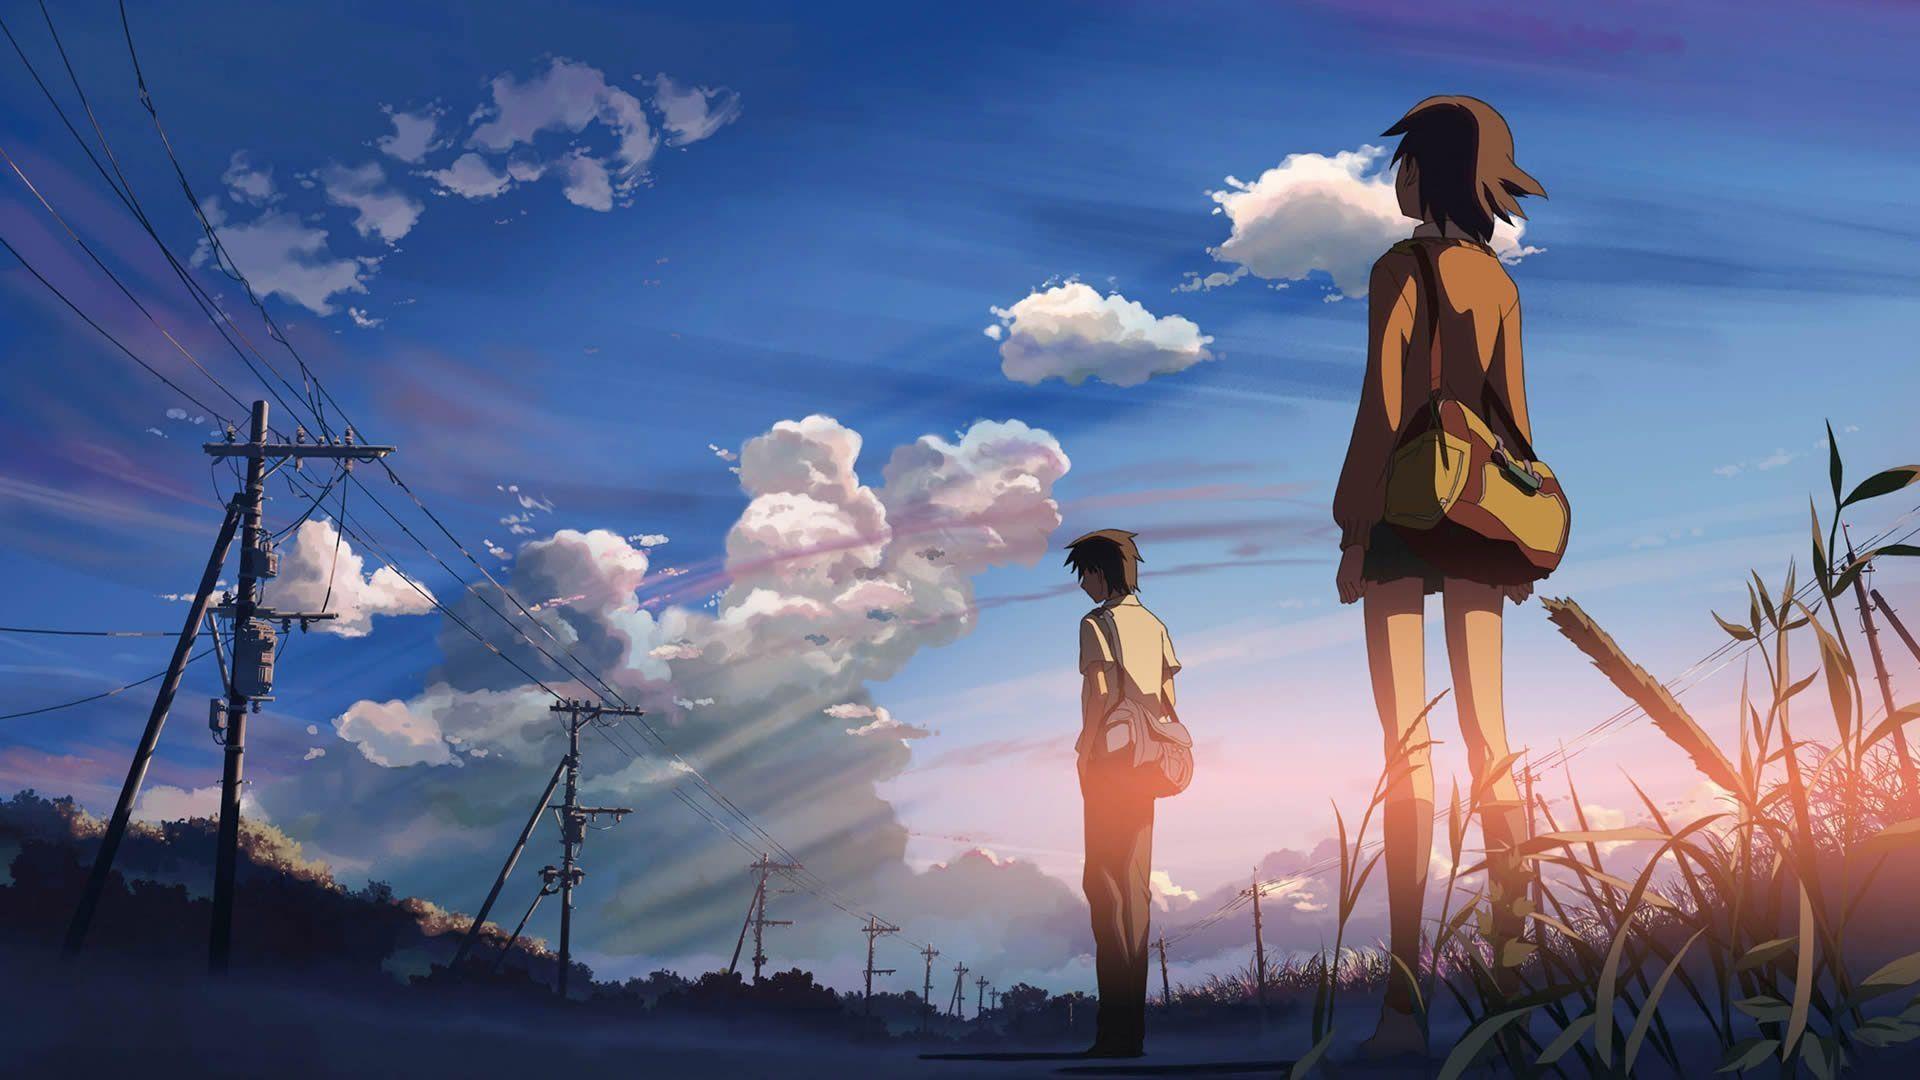 Aesthetic Anime Desktop Wallpapers